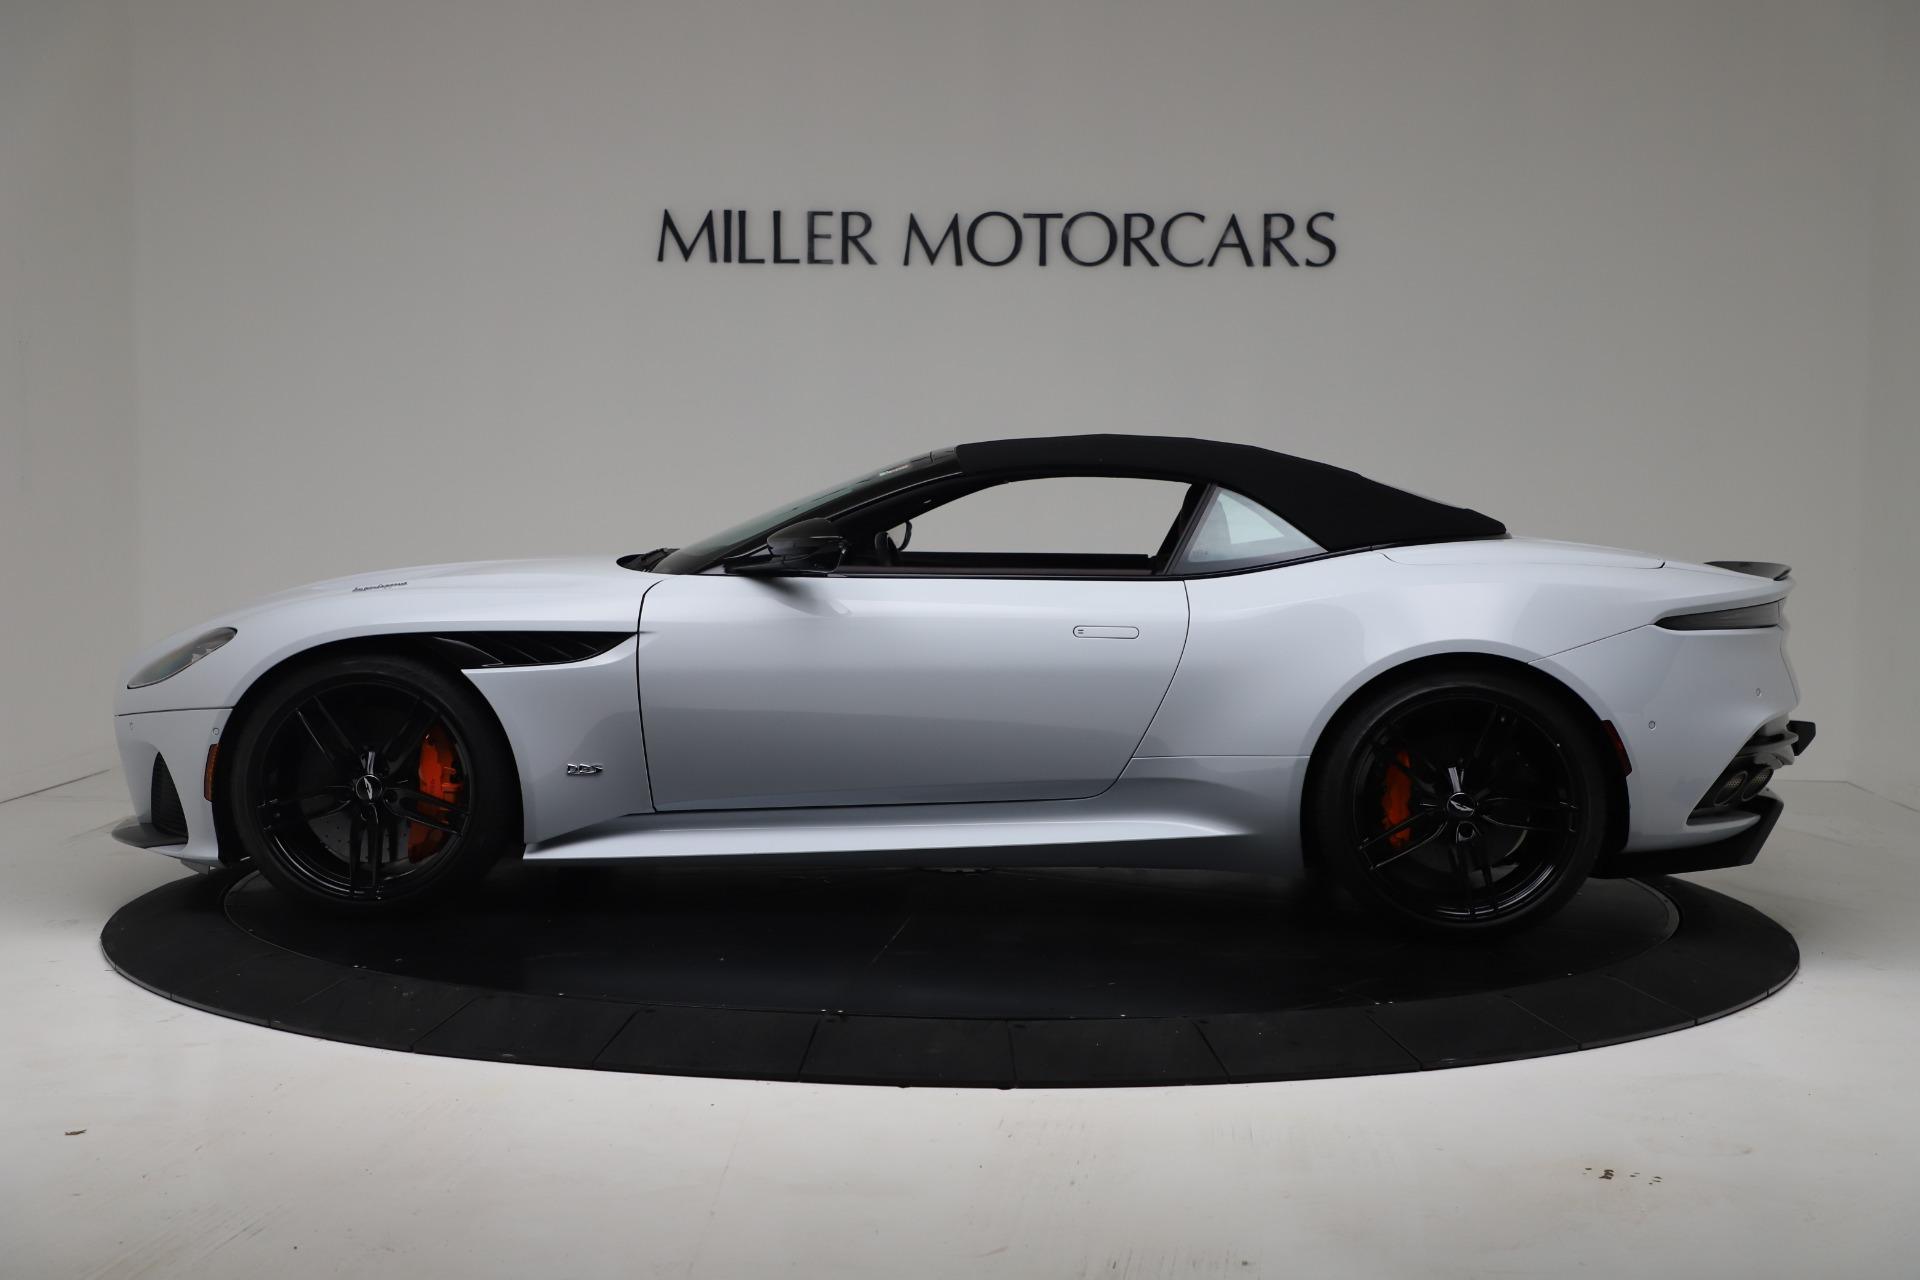 New 2020 Aston Martin DBS Superleggera Volante Convertible For Sale In Westport, CT 3484_p14